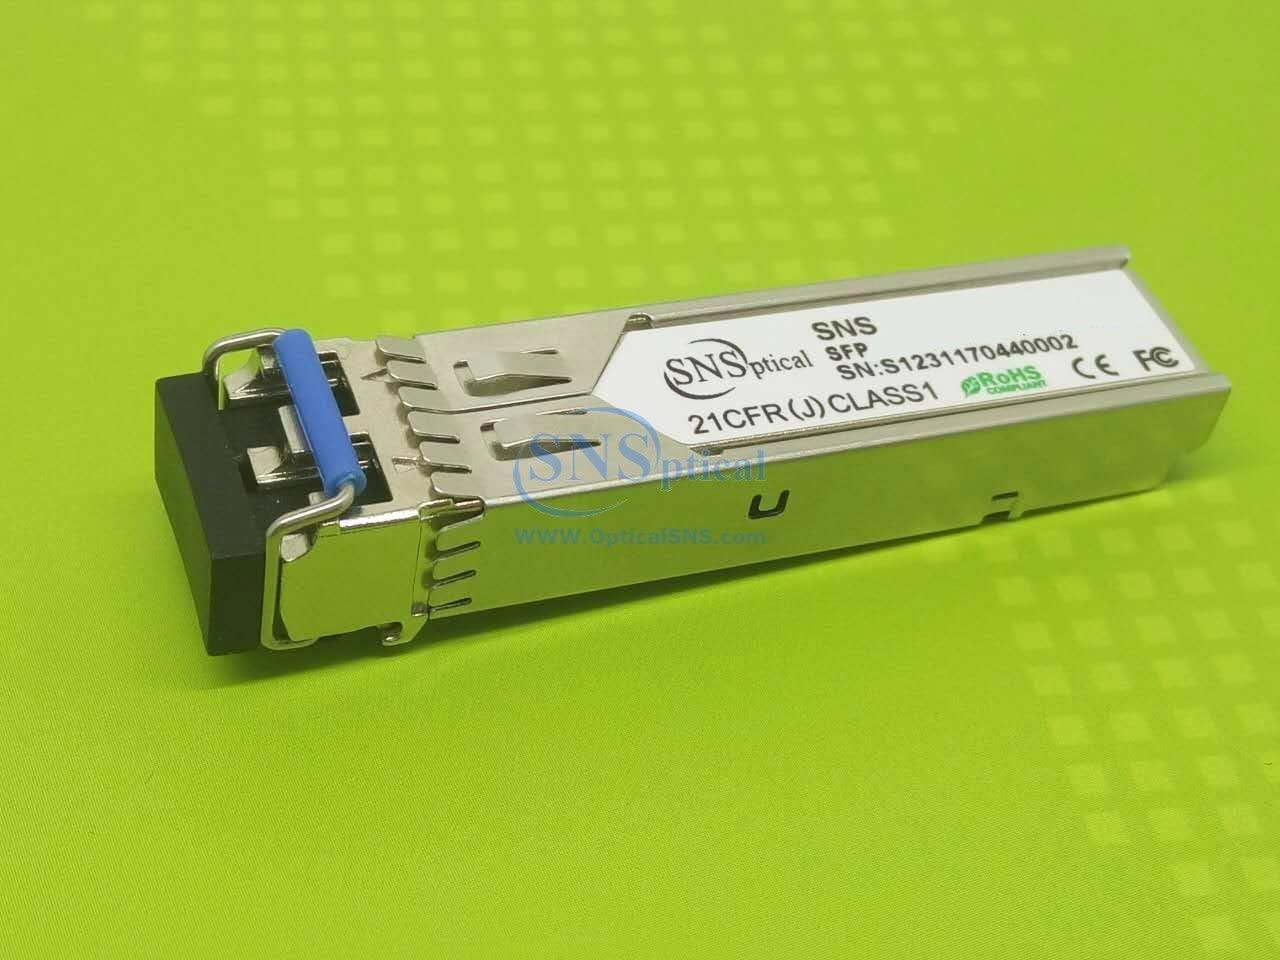 SNS GLC-LH-SMD Compatible with Cisco GLC-LH-SMD 1000BASE-LX/LH SFP 1310nm 10km EXT DDM Transceiver Module